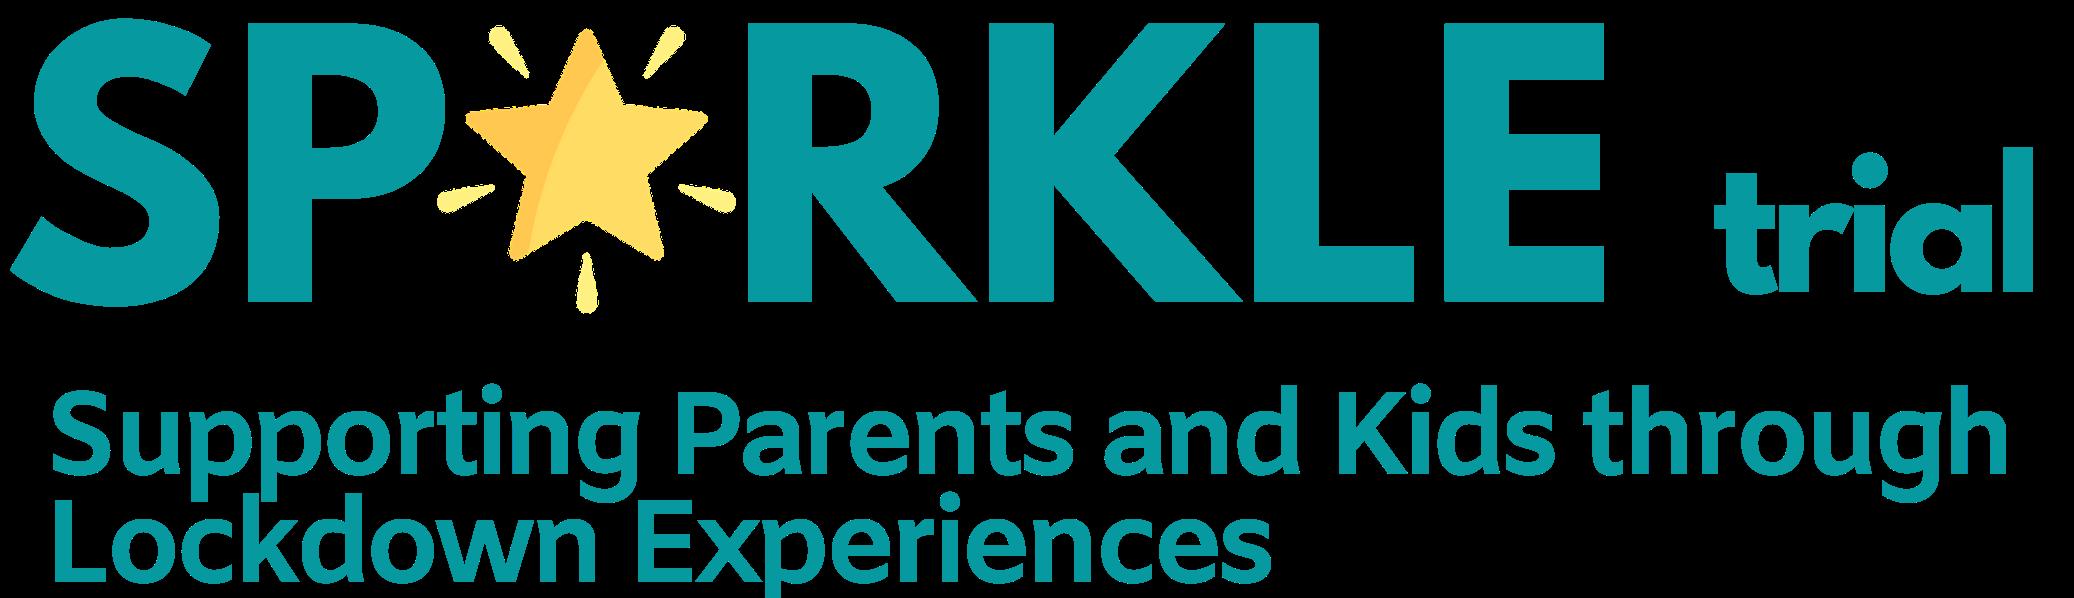 SPARKLE logo_large